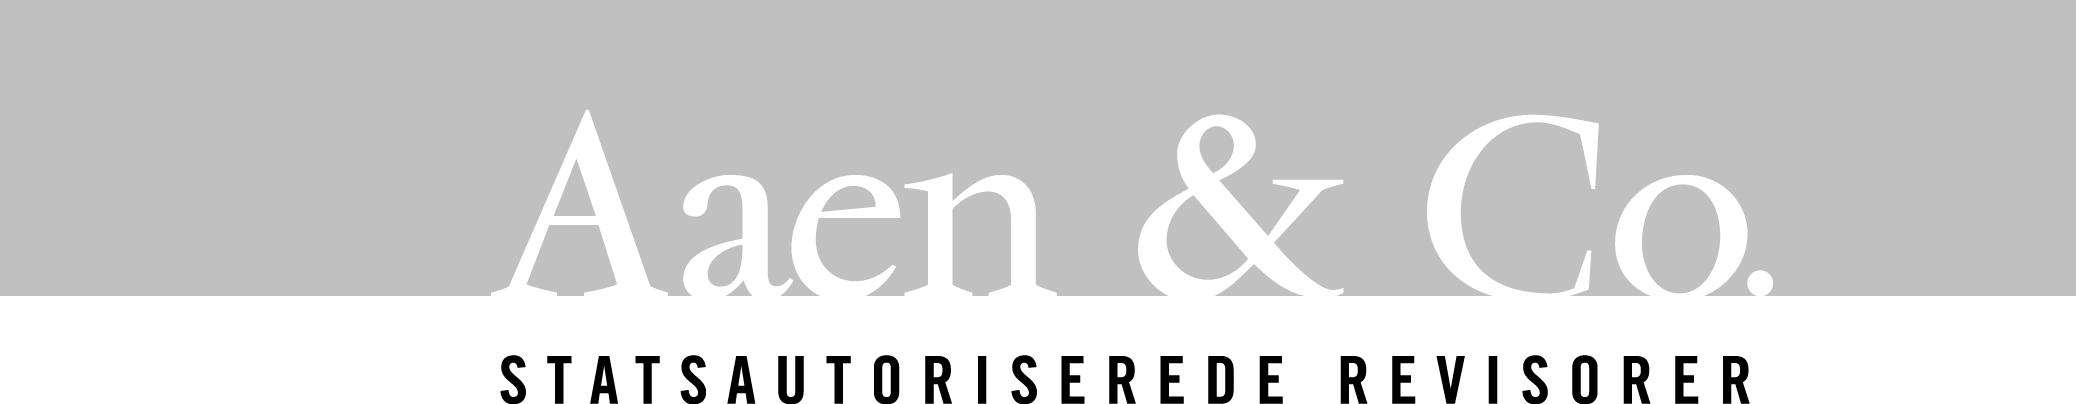 Aaens logo